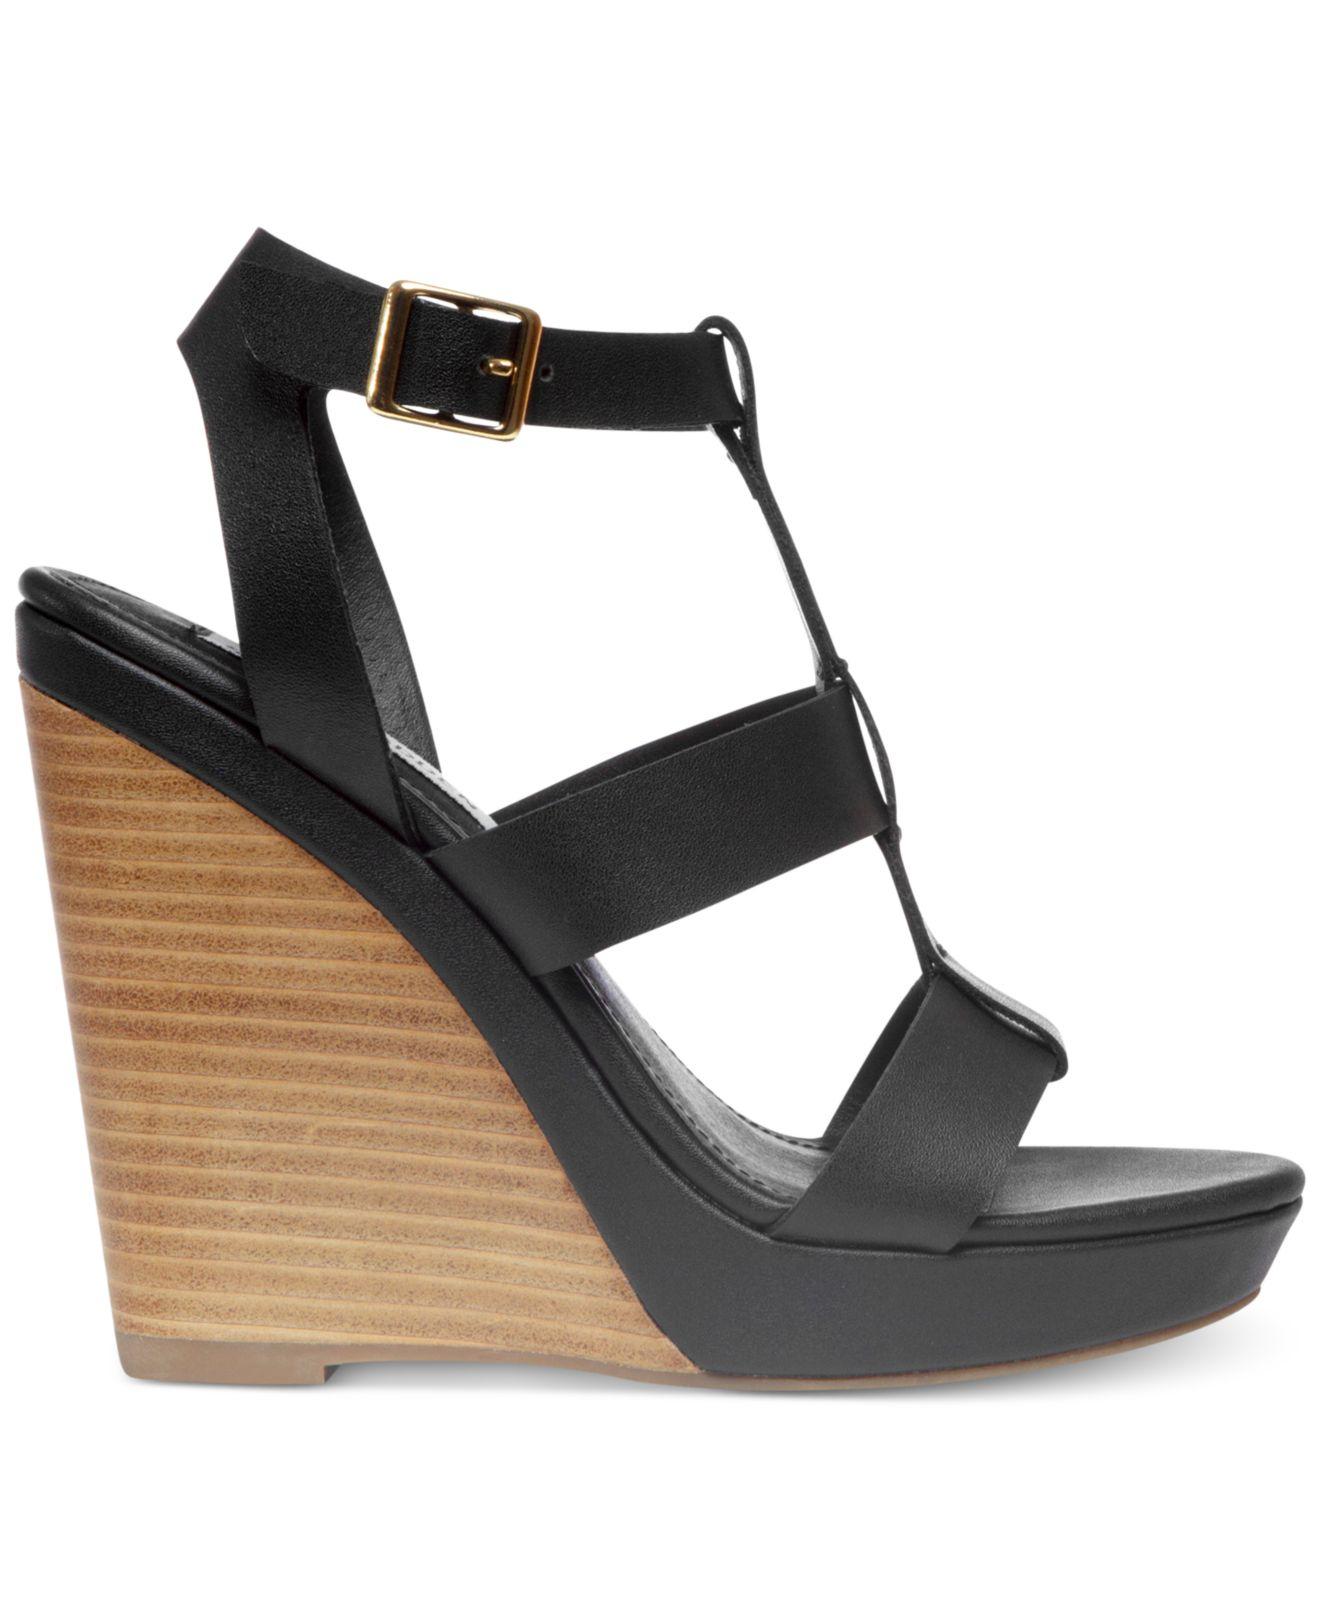 14982c5cb3 Lyst - Steve Madden Womens Iris Platform Wedge Sandals in Black